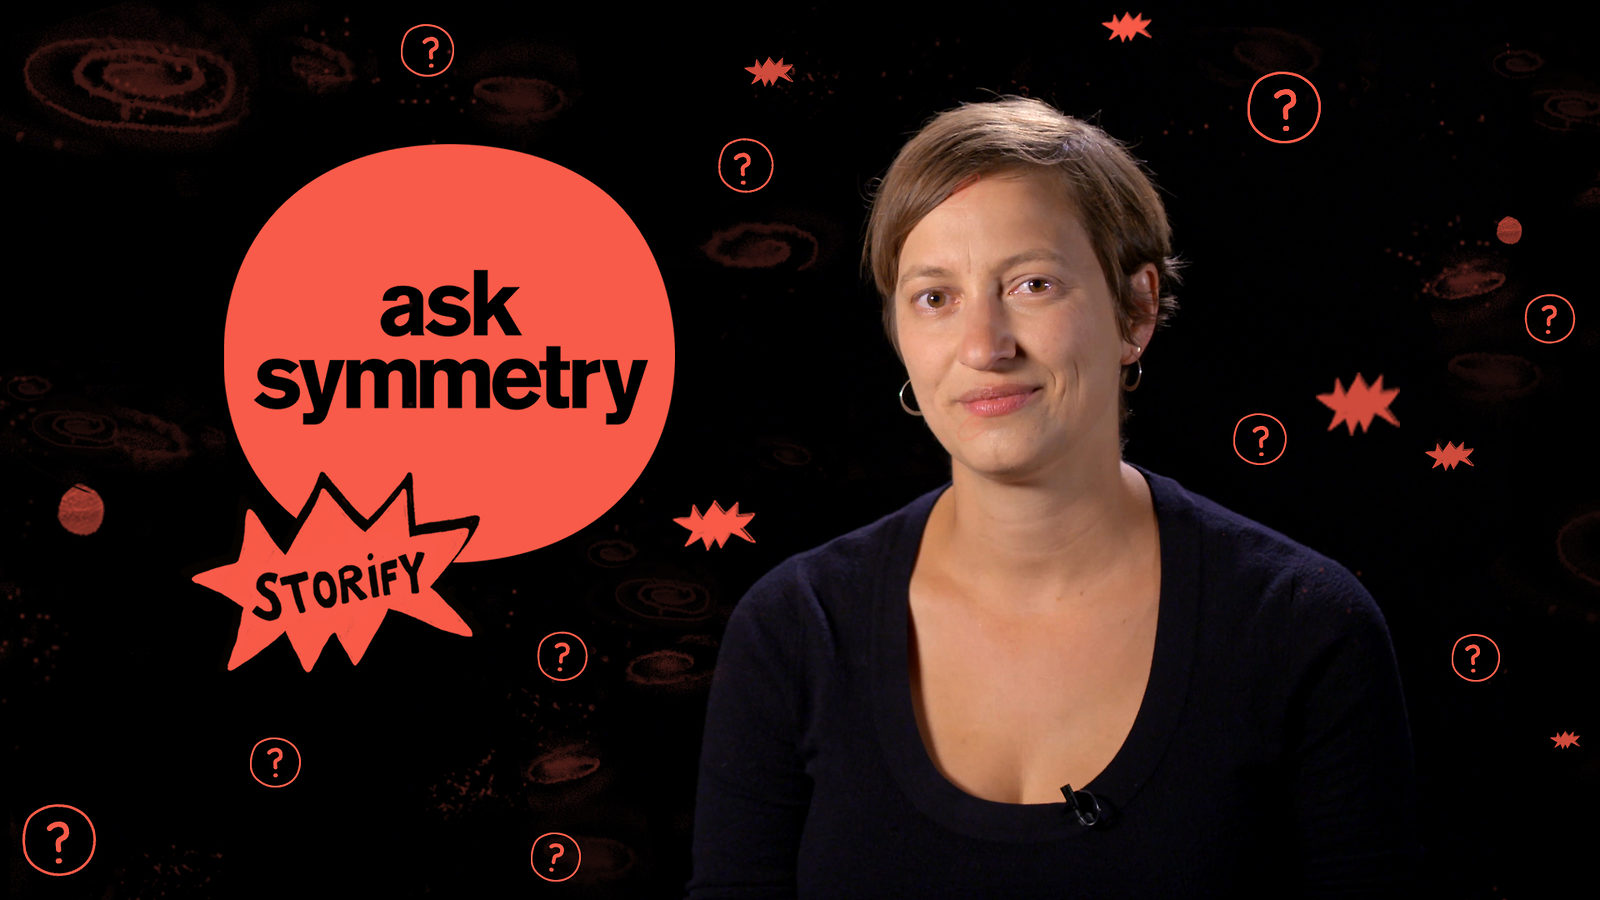 Image: AskSymmetry Risa Wechsler Storify